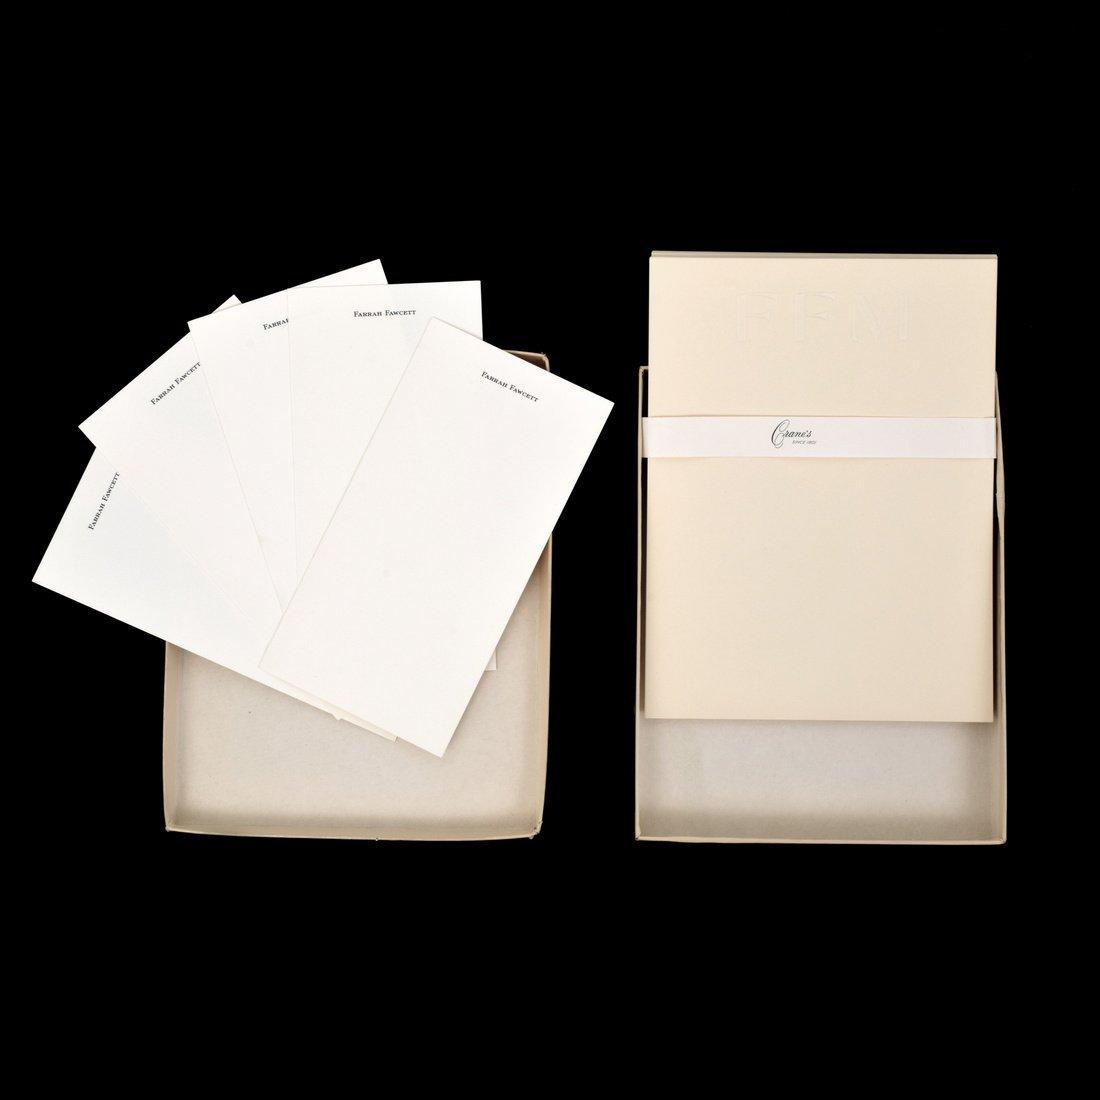 Farrah Fawcett Personal Monogrammed Stationery - 3